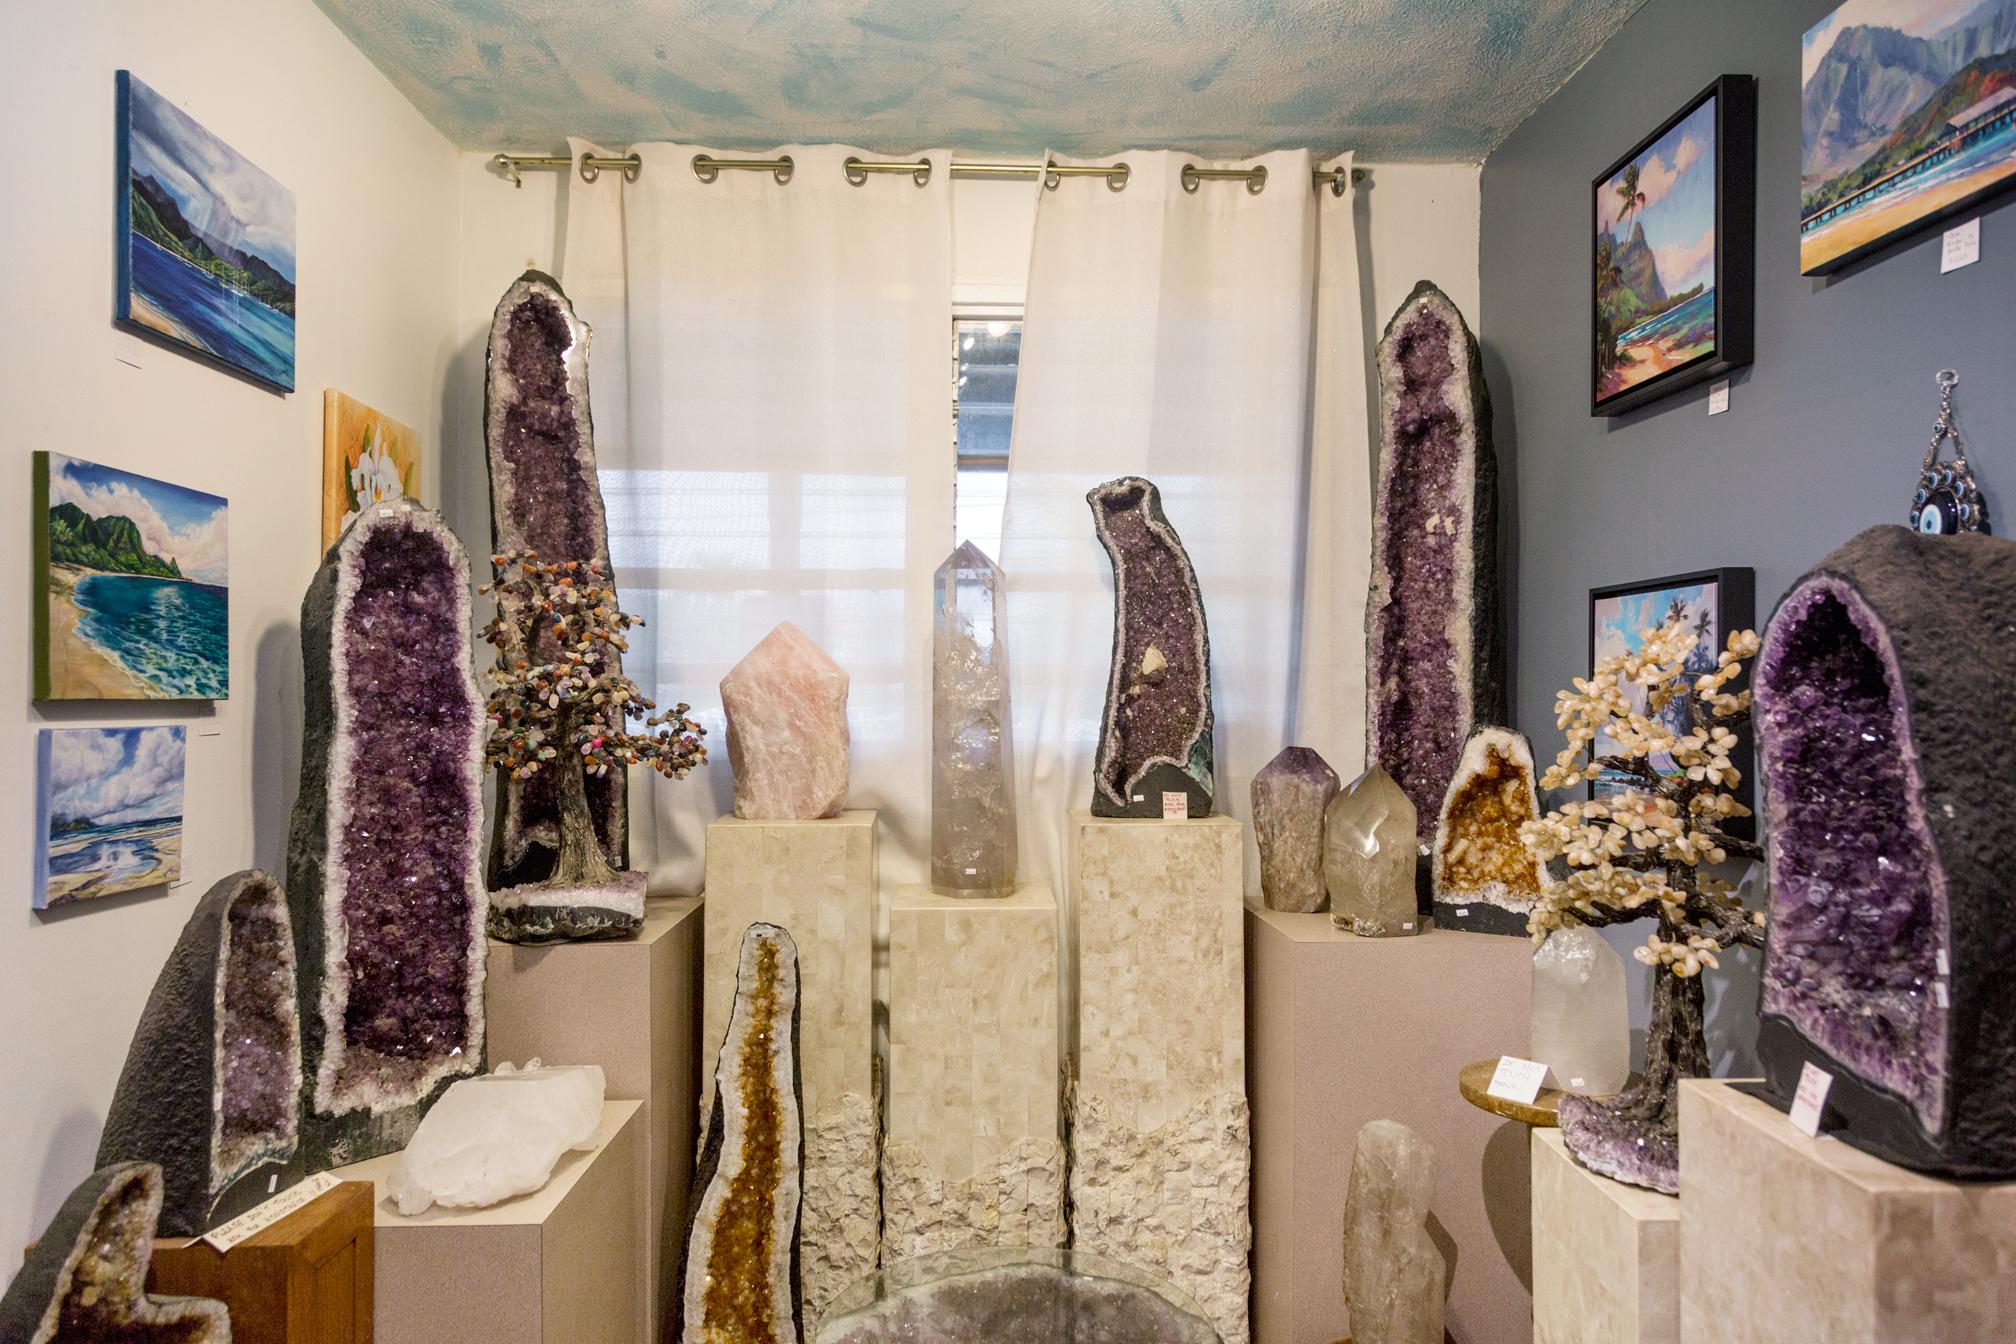 Crystals and Gems Gallery, Kaua'i